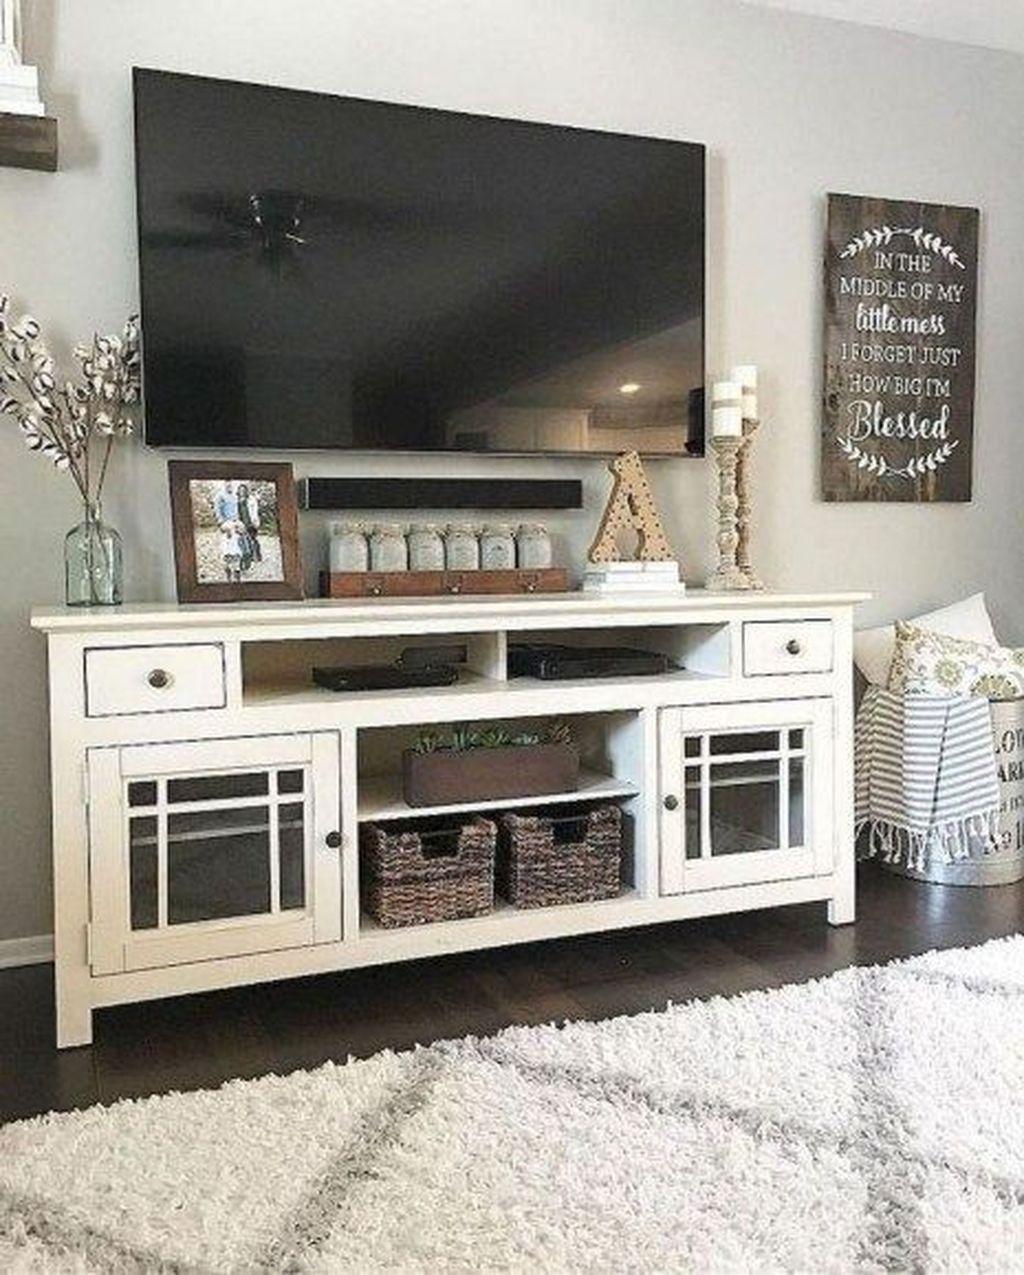 40+ Amazing Modern Farmhouse Style Decoration Ideas For Your Living Room #modernfarmhousestyle